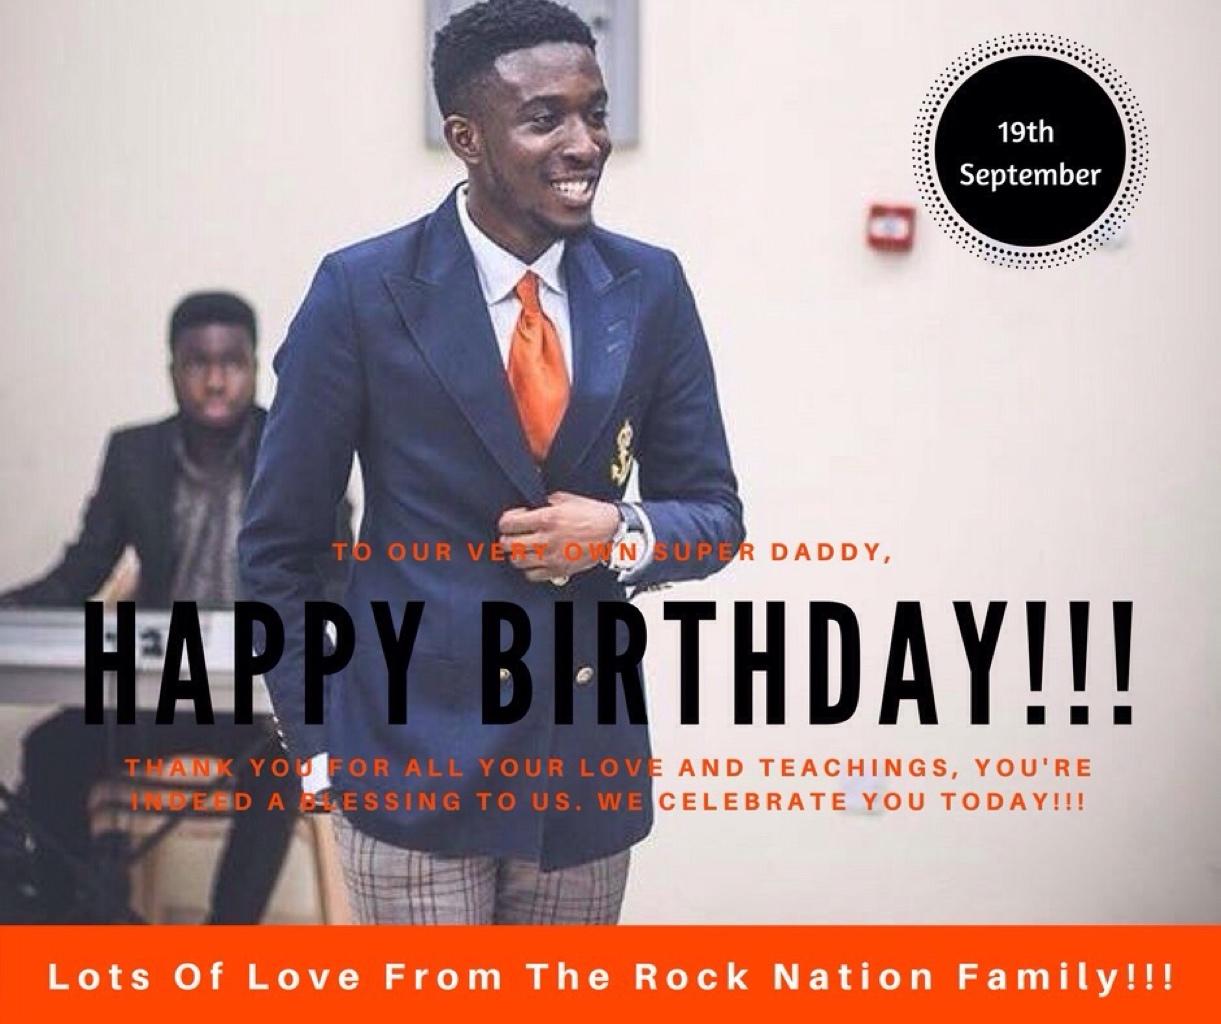 Happy Birthday Sir @e-rock 🎊